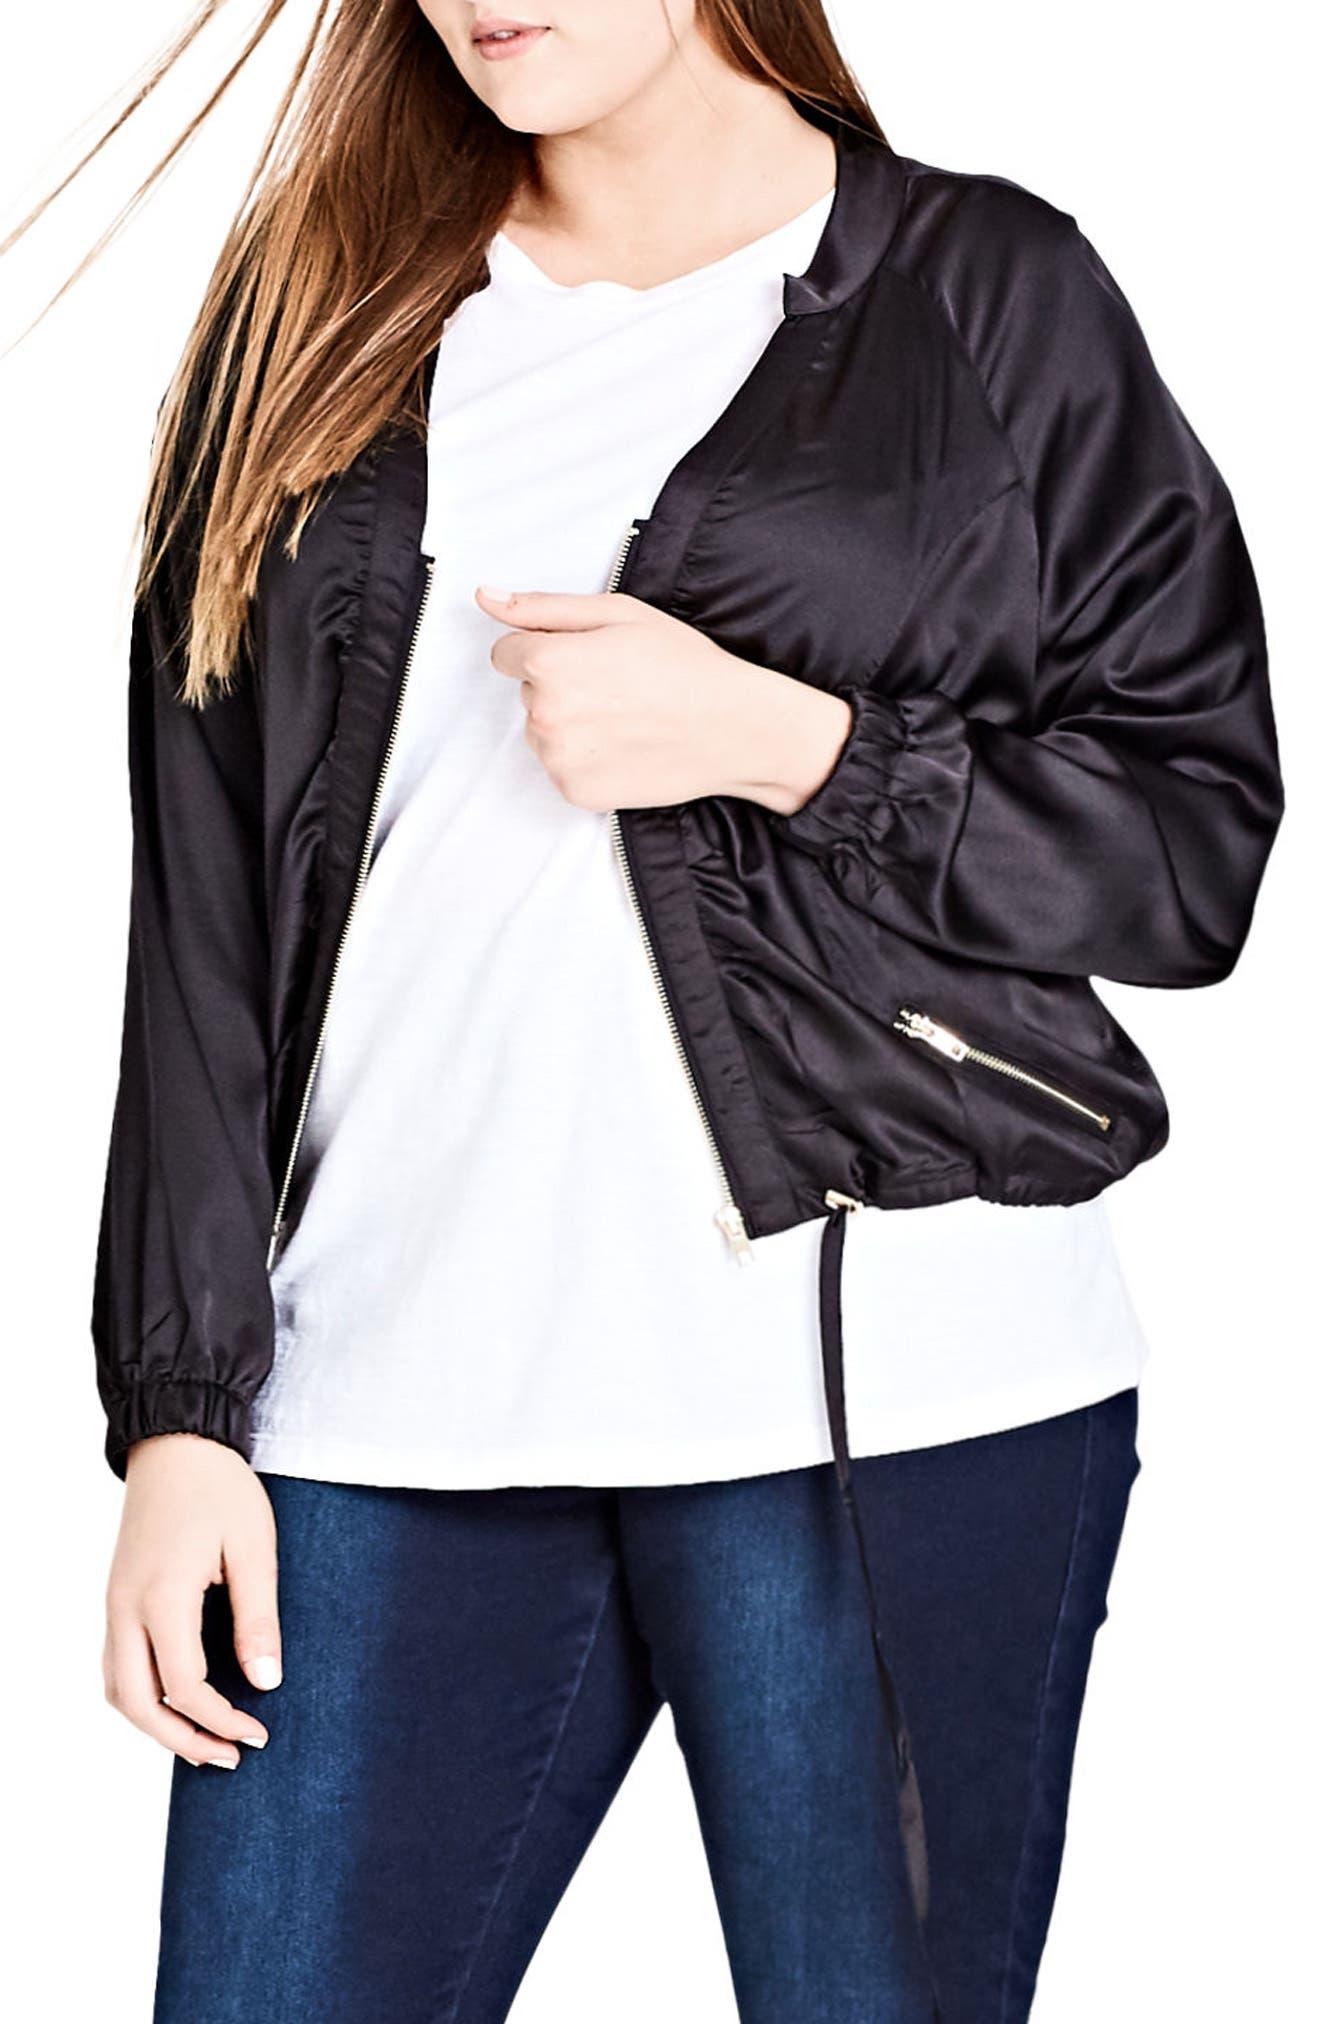 Alternate Image 1 Selected - City Chic 'Jungle Heat' Jacket (Plus Size)